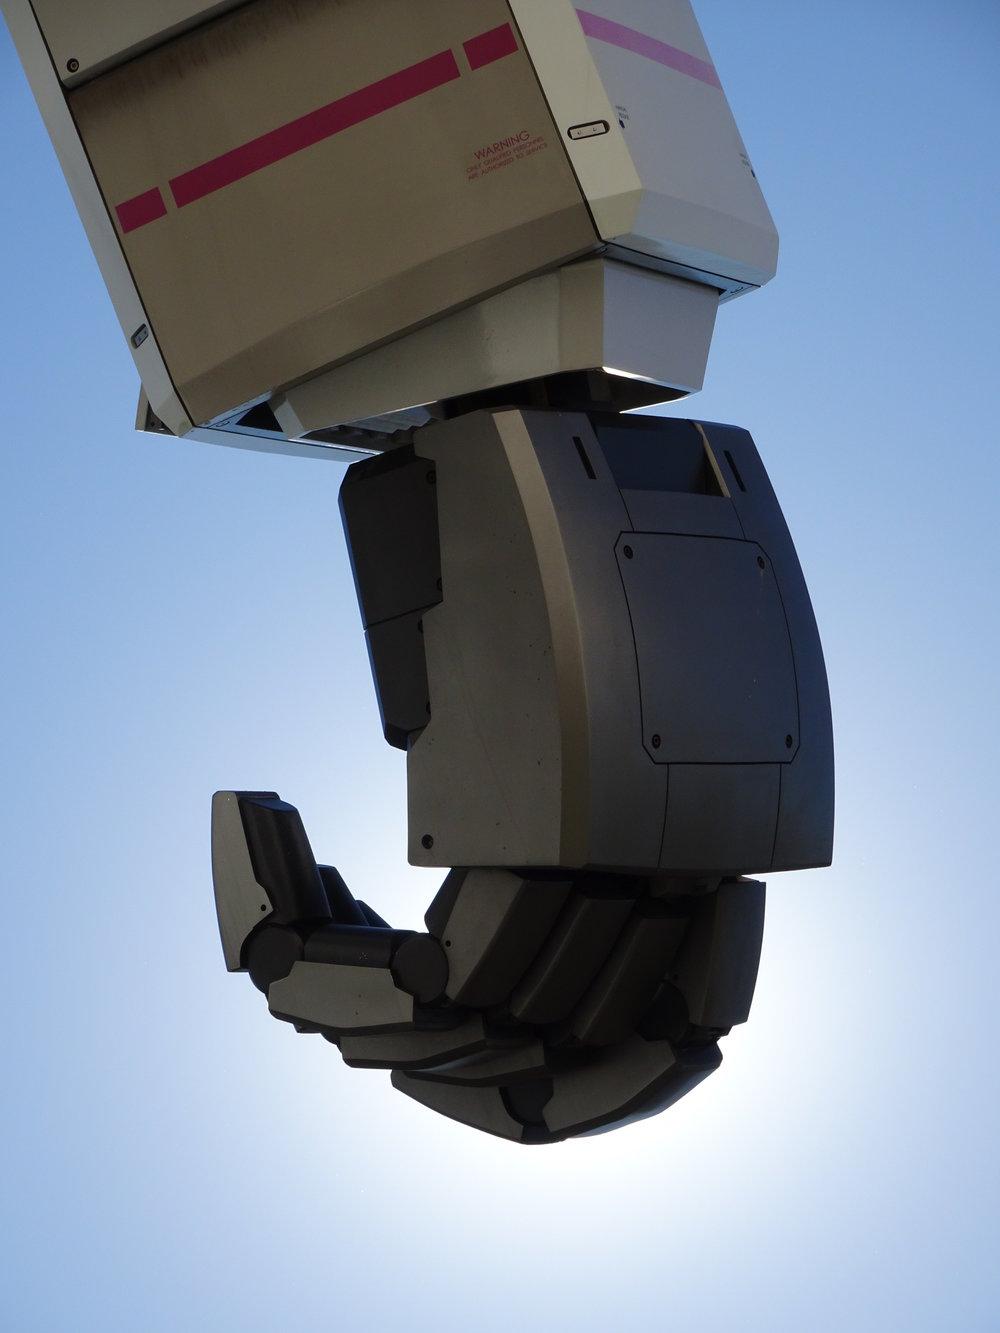 RX-78-2 Gundam 1-1 Statue - 050.jpg